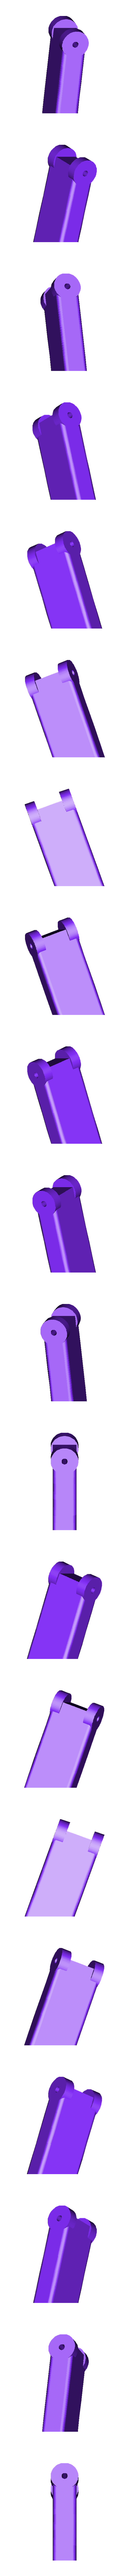 main_screen_leg_2.stl Download free STL file ORCA communicator (Godzilla) • 3D printing object, poblocki1982